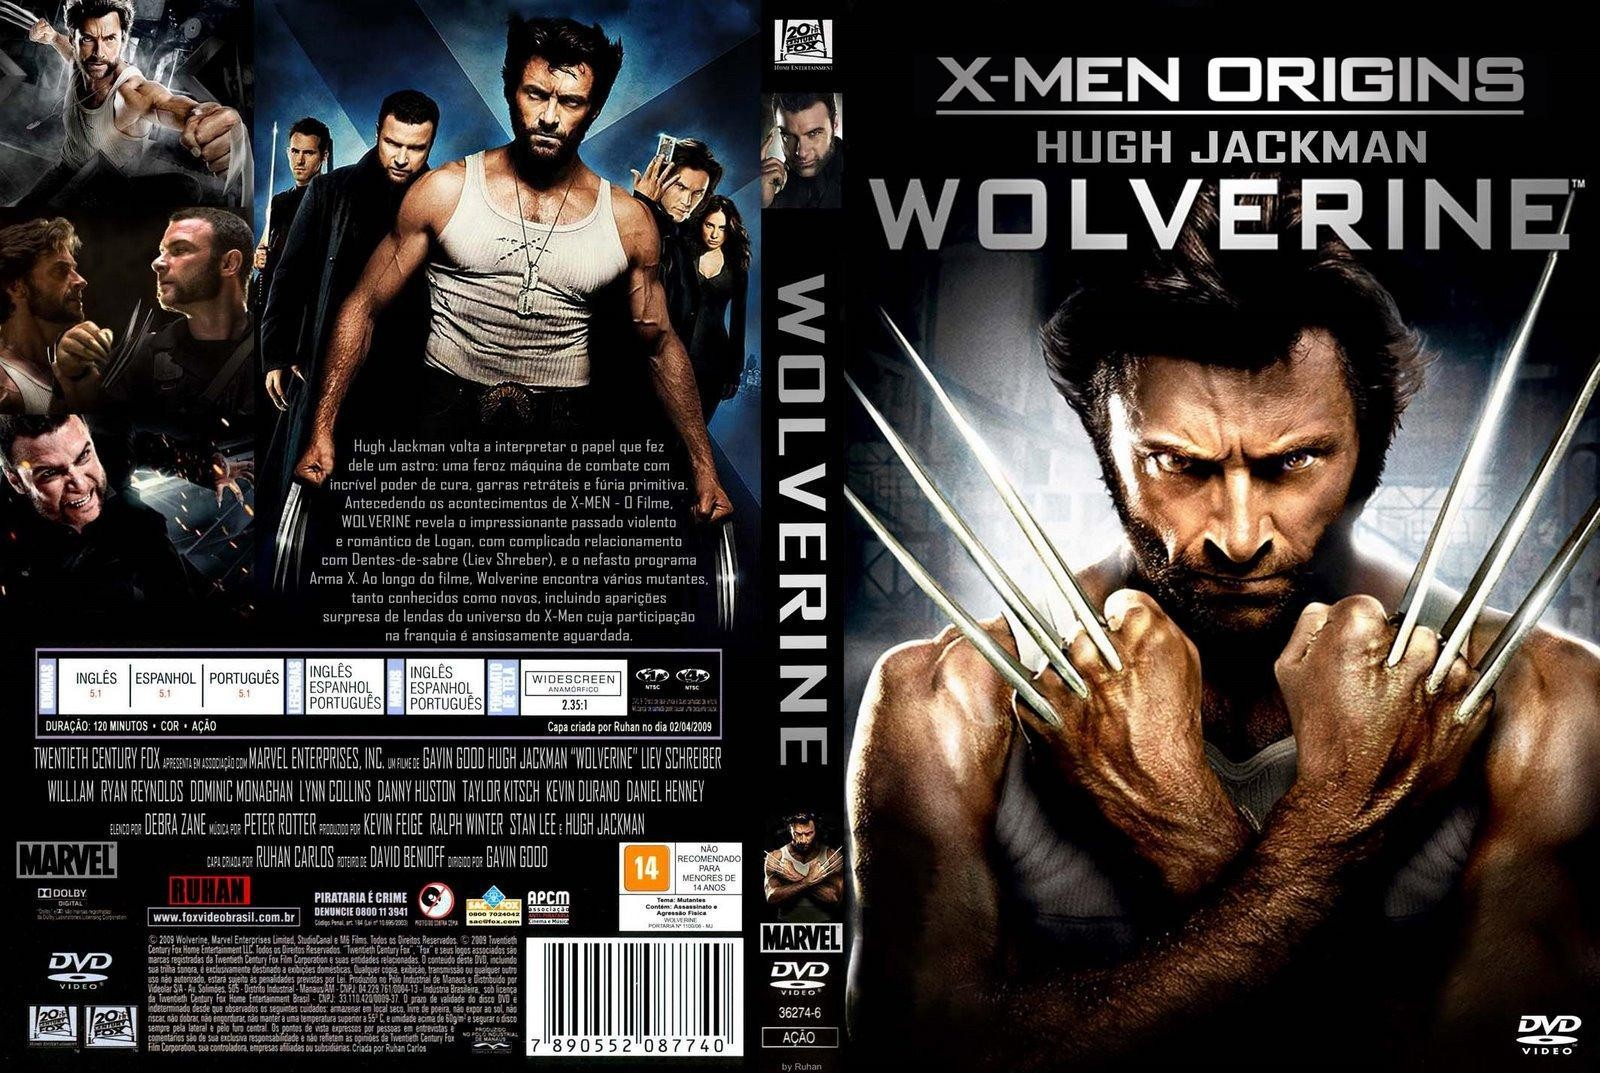 filme x-men origens wolverine dublado avi